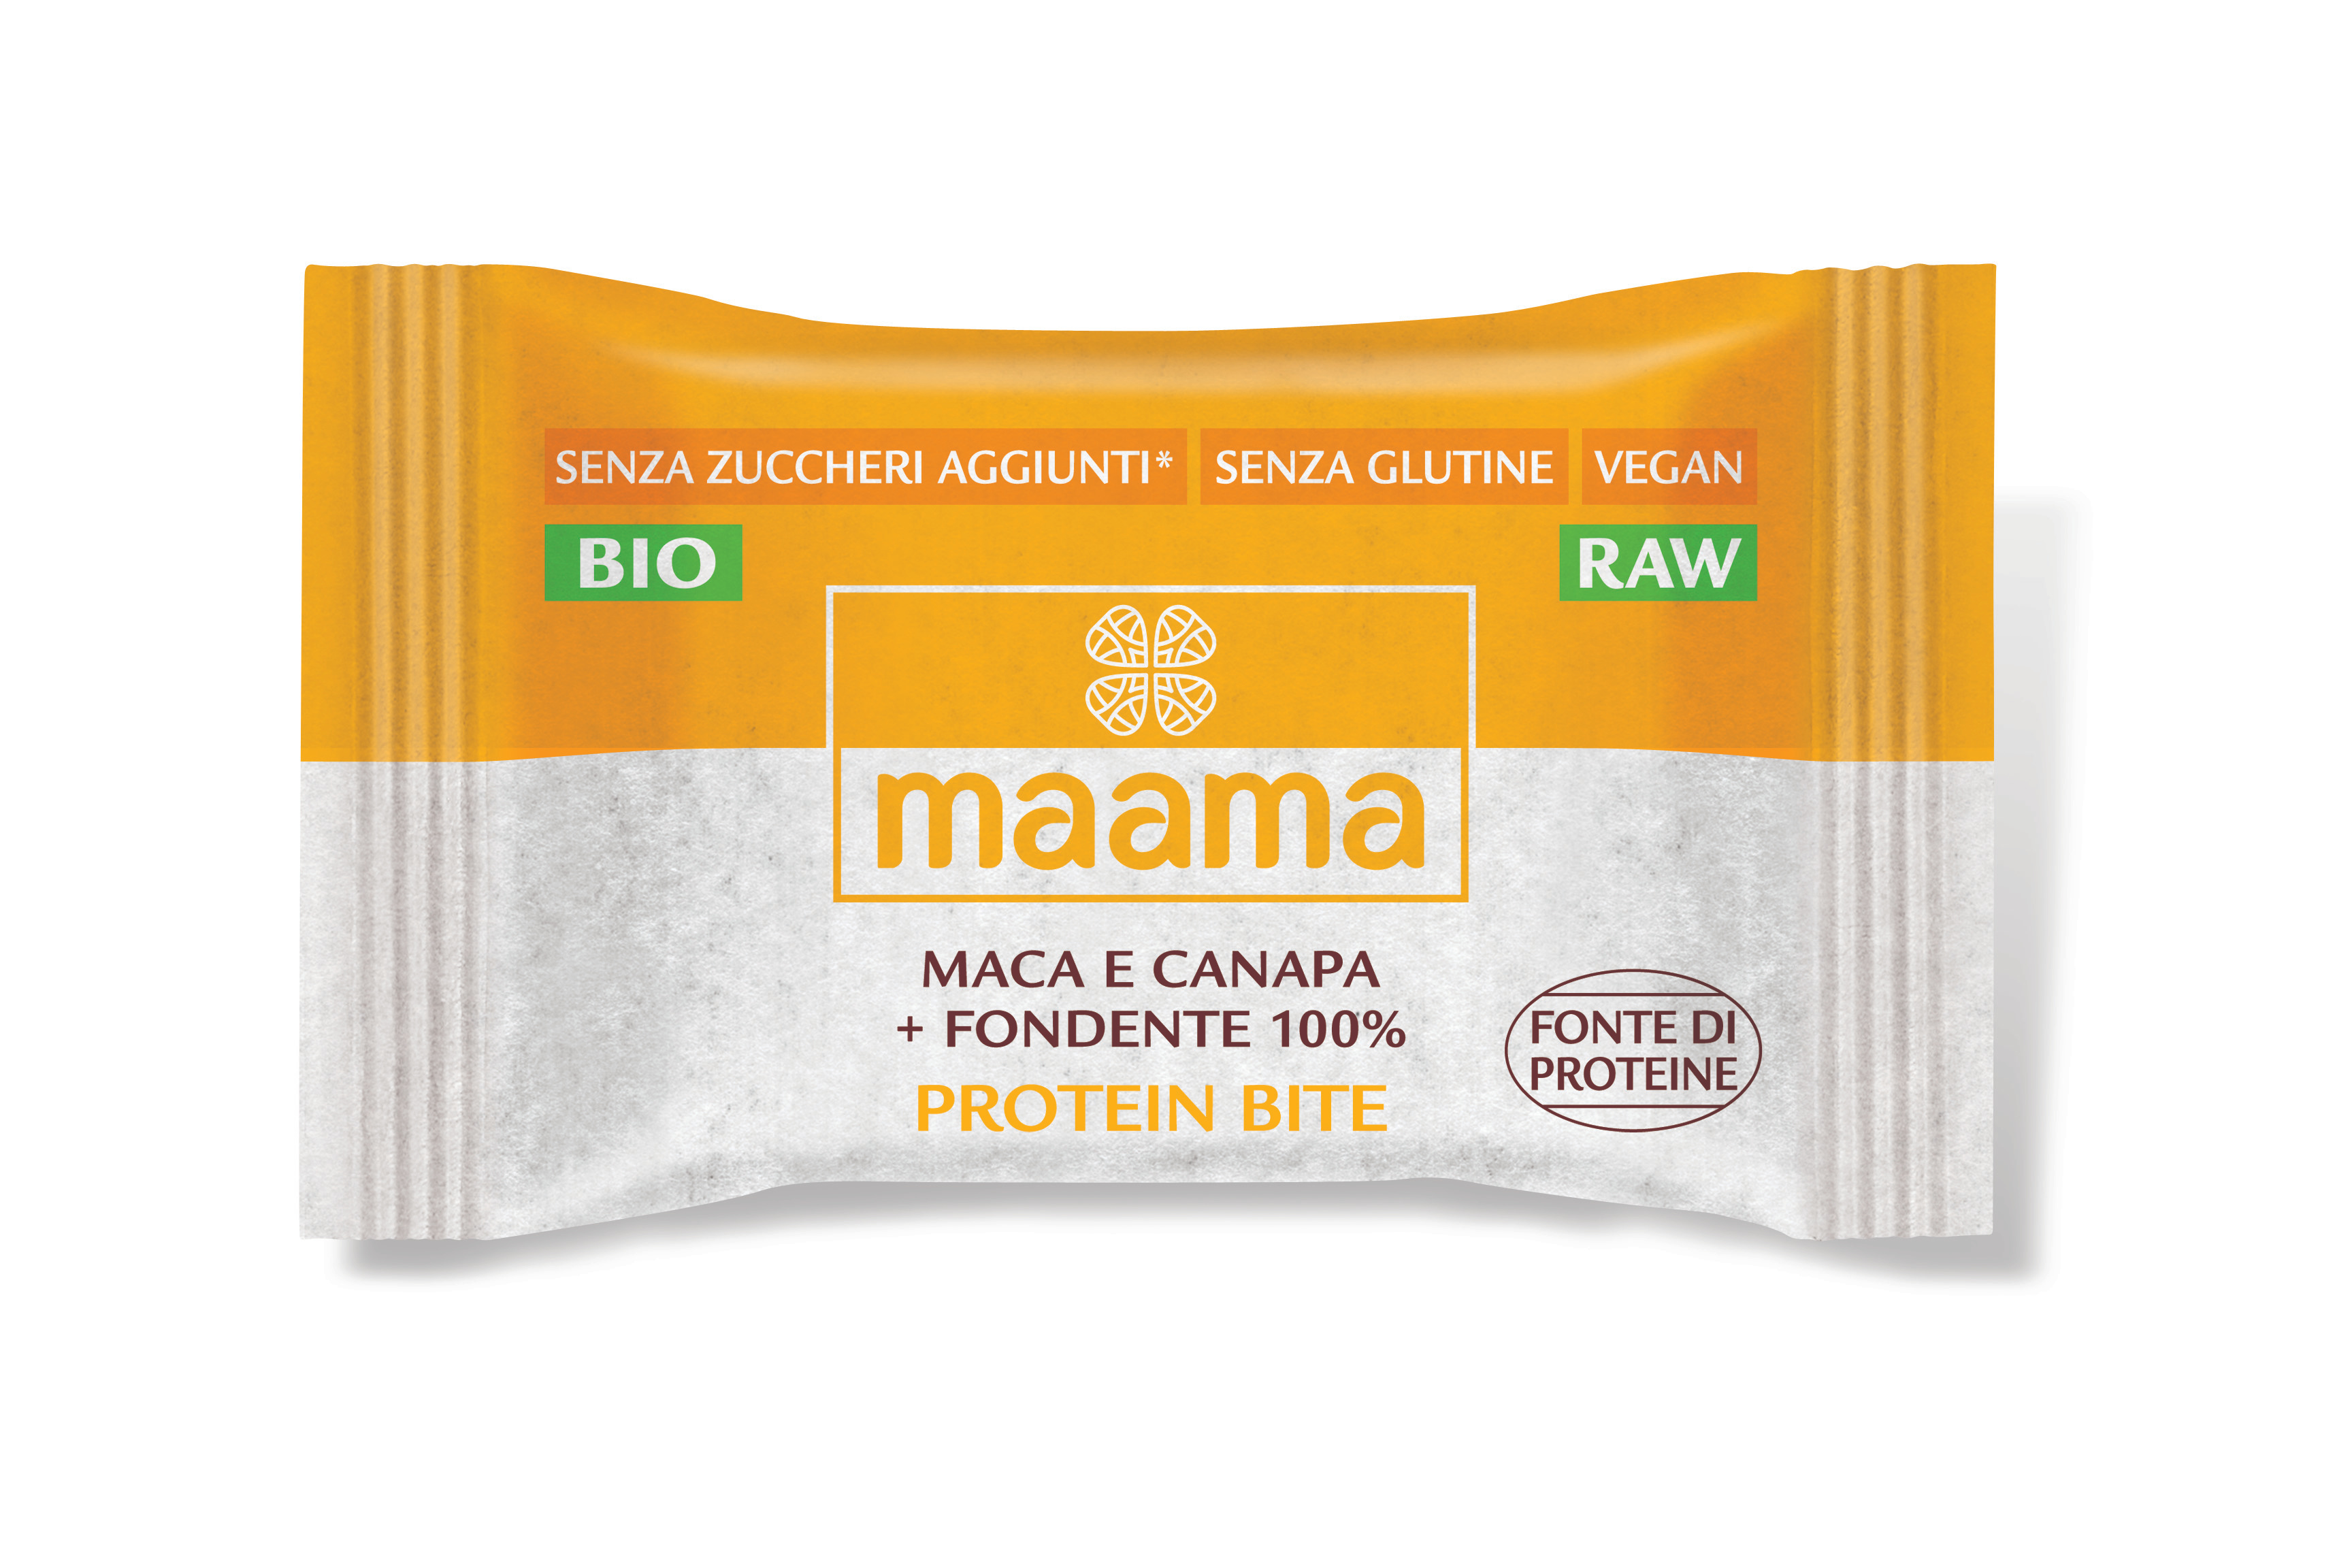 Bite Maca & Canapa